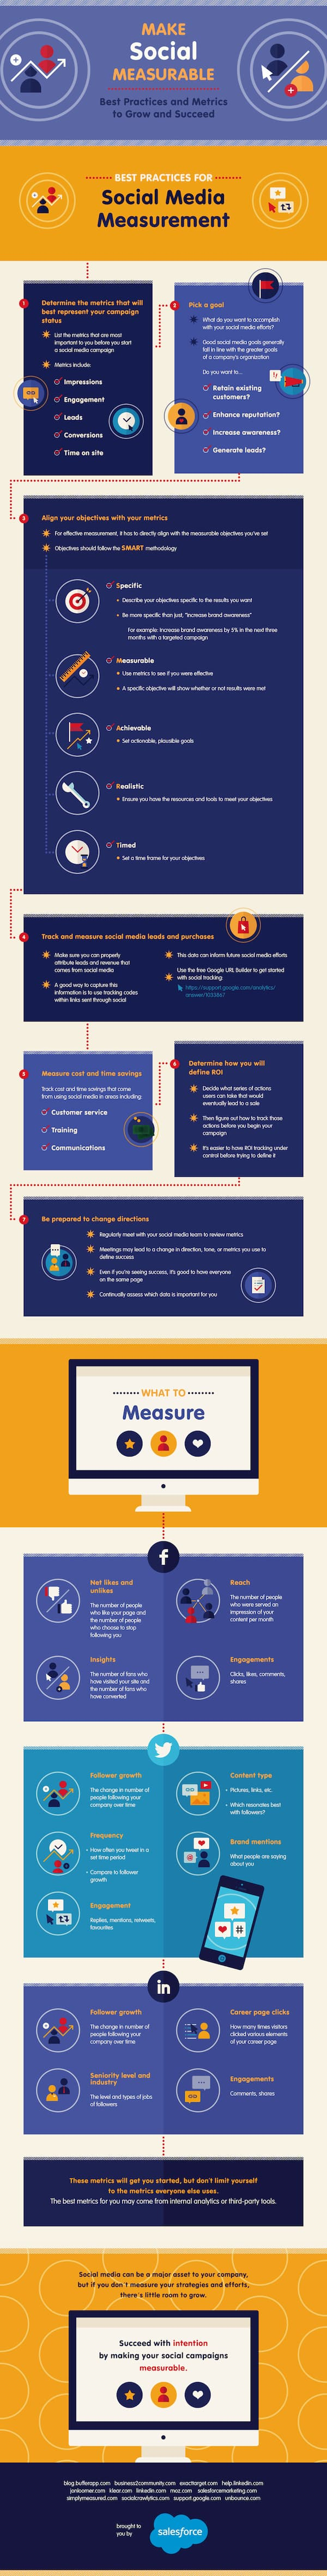 metricas-en-redes-sociales-infografia-1